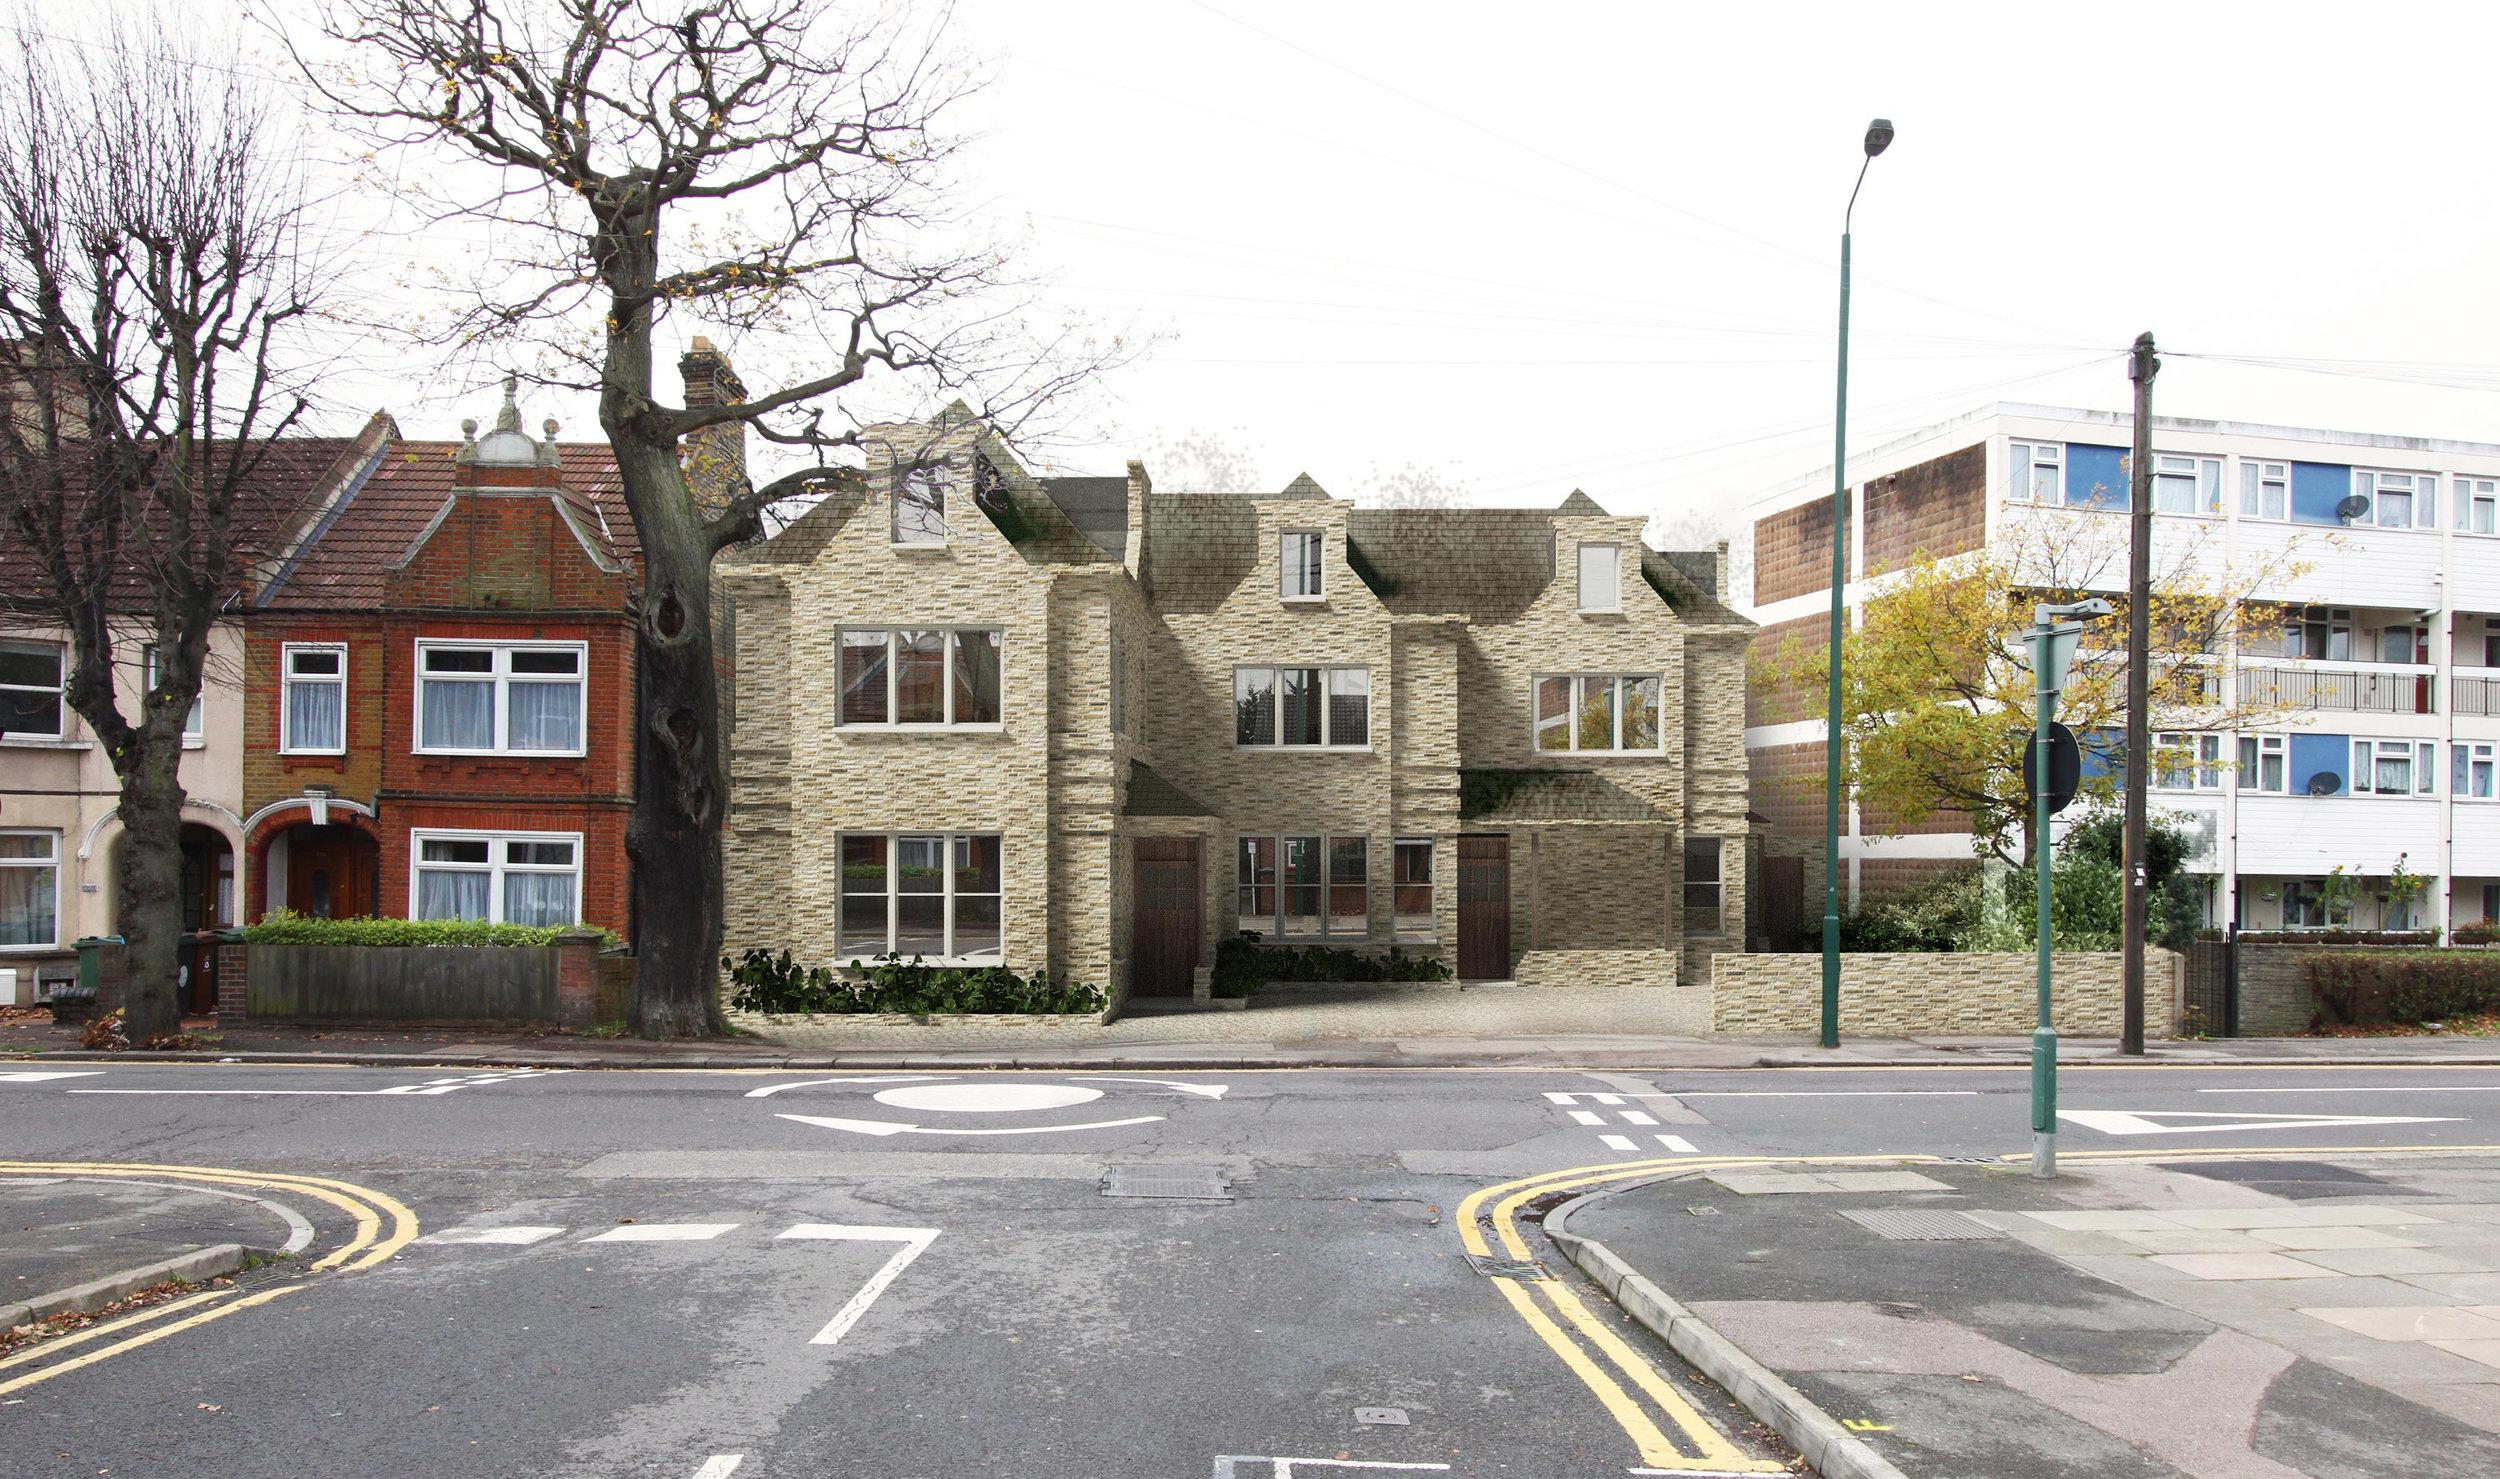 CFL-Chigford0Lane-Street-Front-Craeft-Architects.jpg